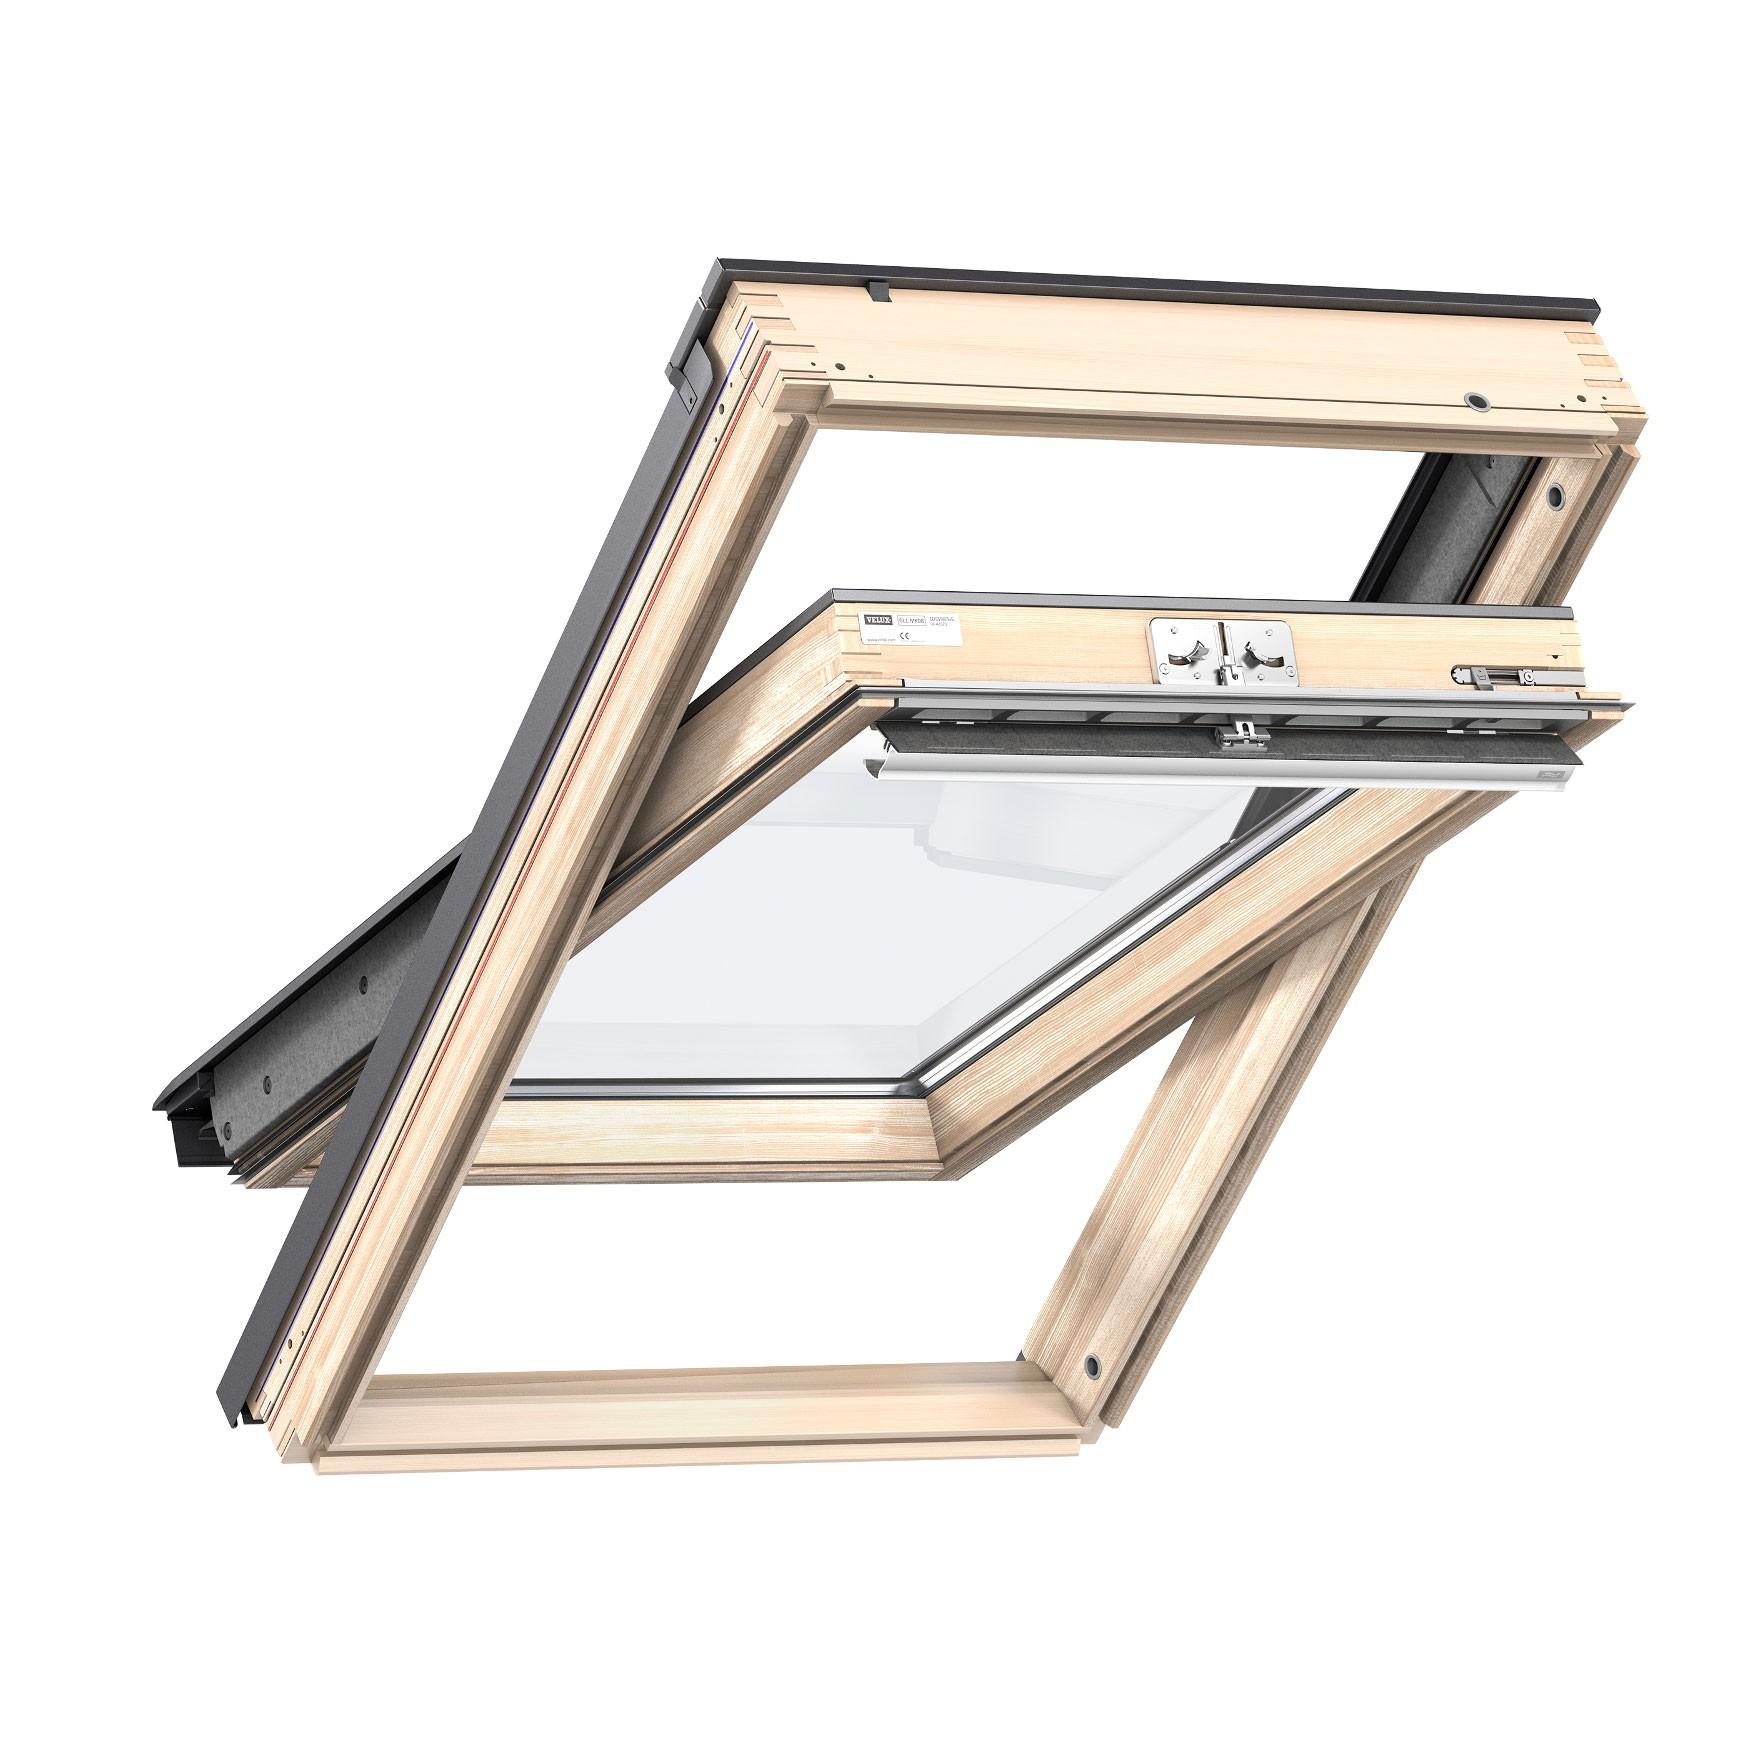 Dedeman fereastra de mansarda velux standard gzl 1051 mk08 - Velux 140 78 ...